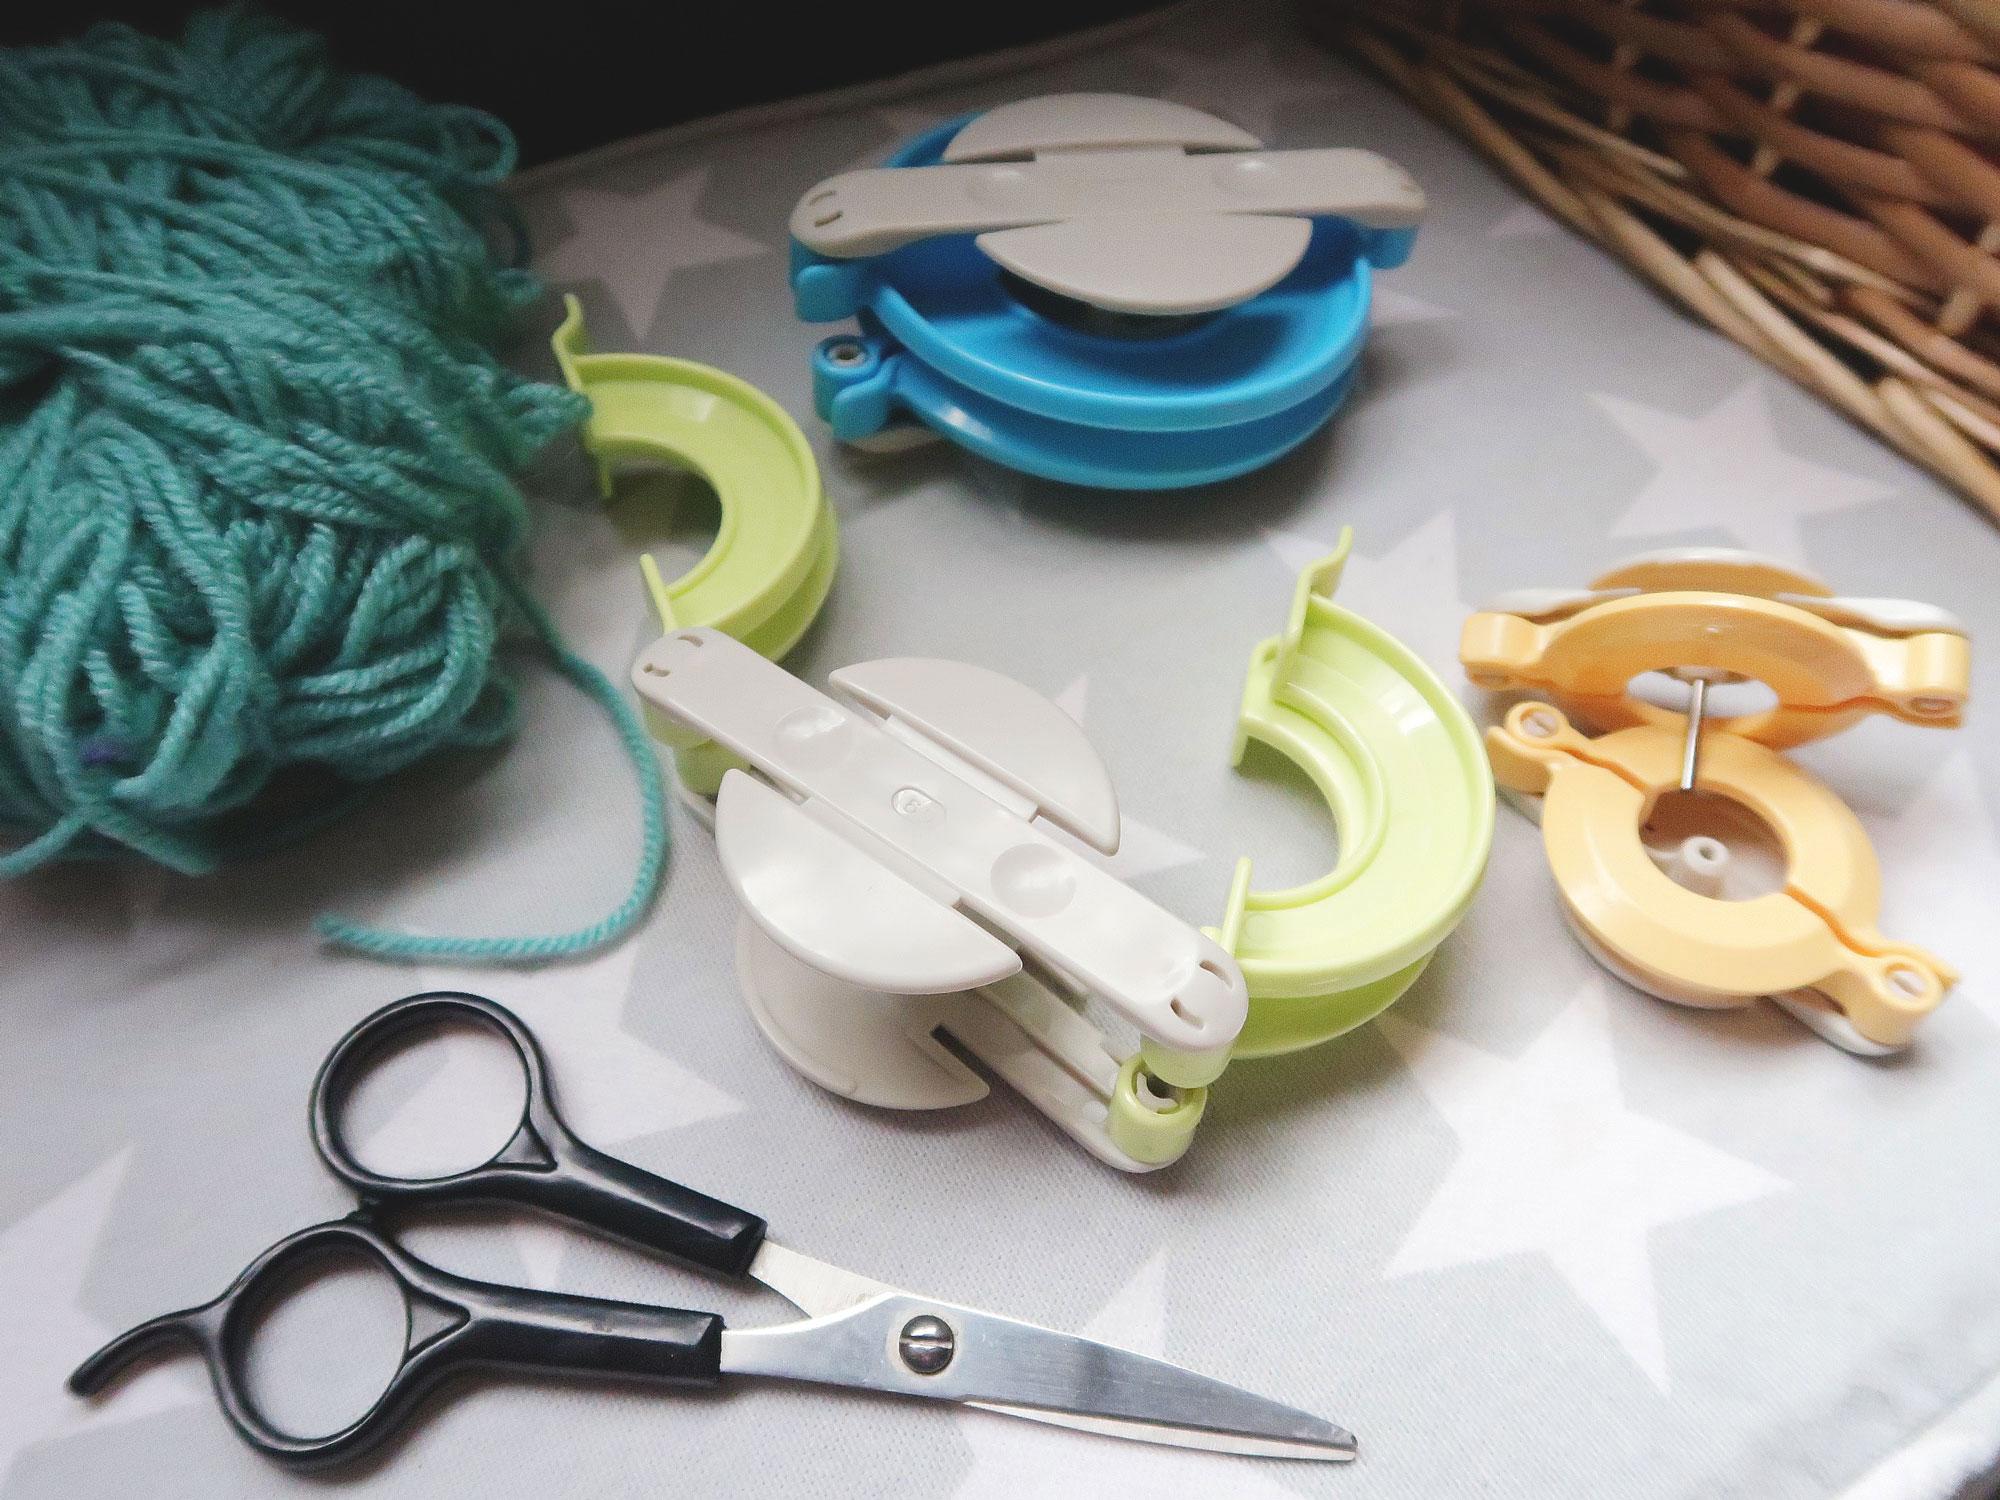 pom_pom_making_tools